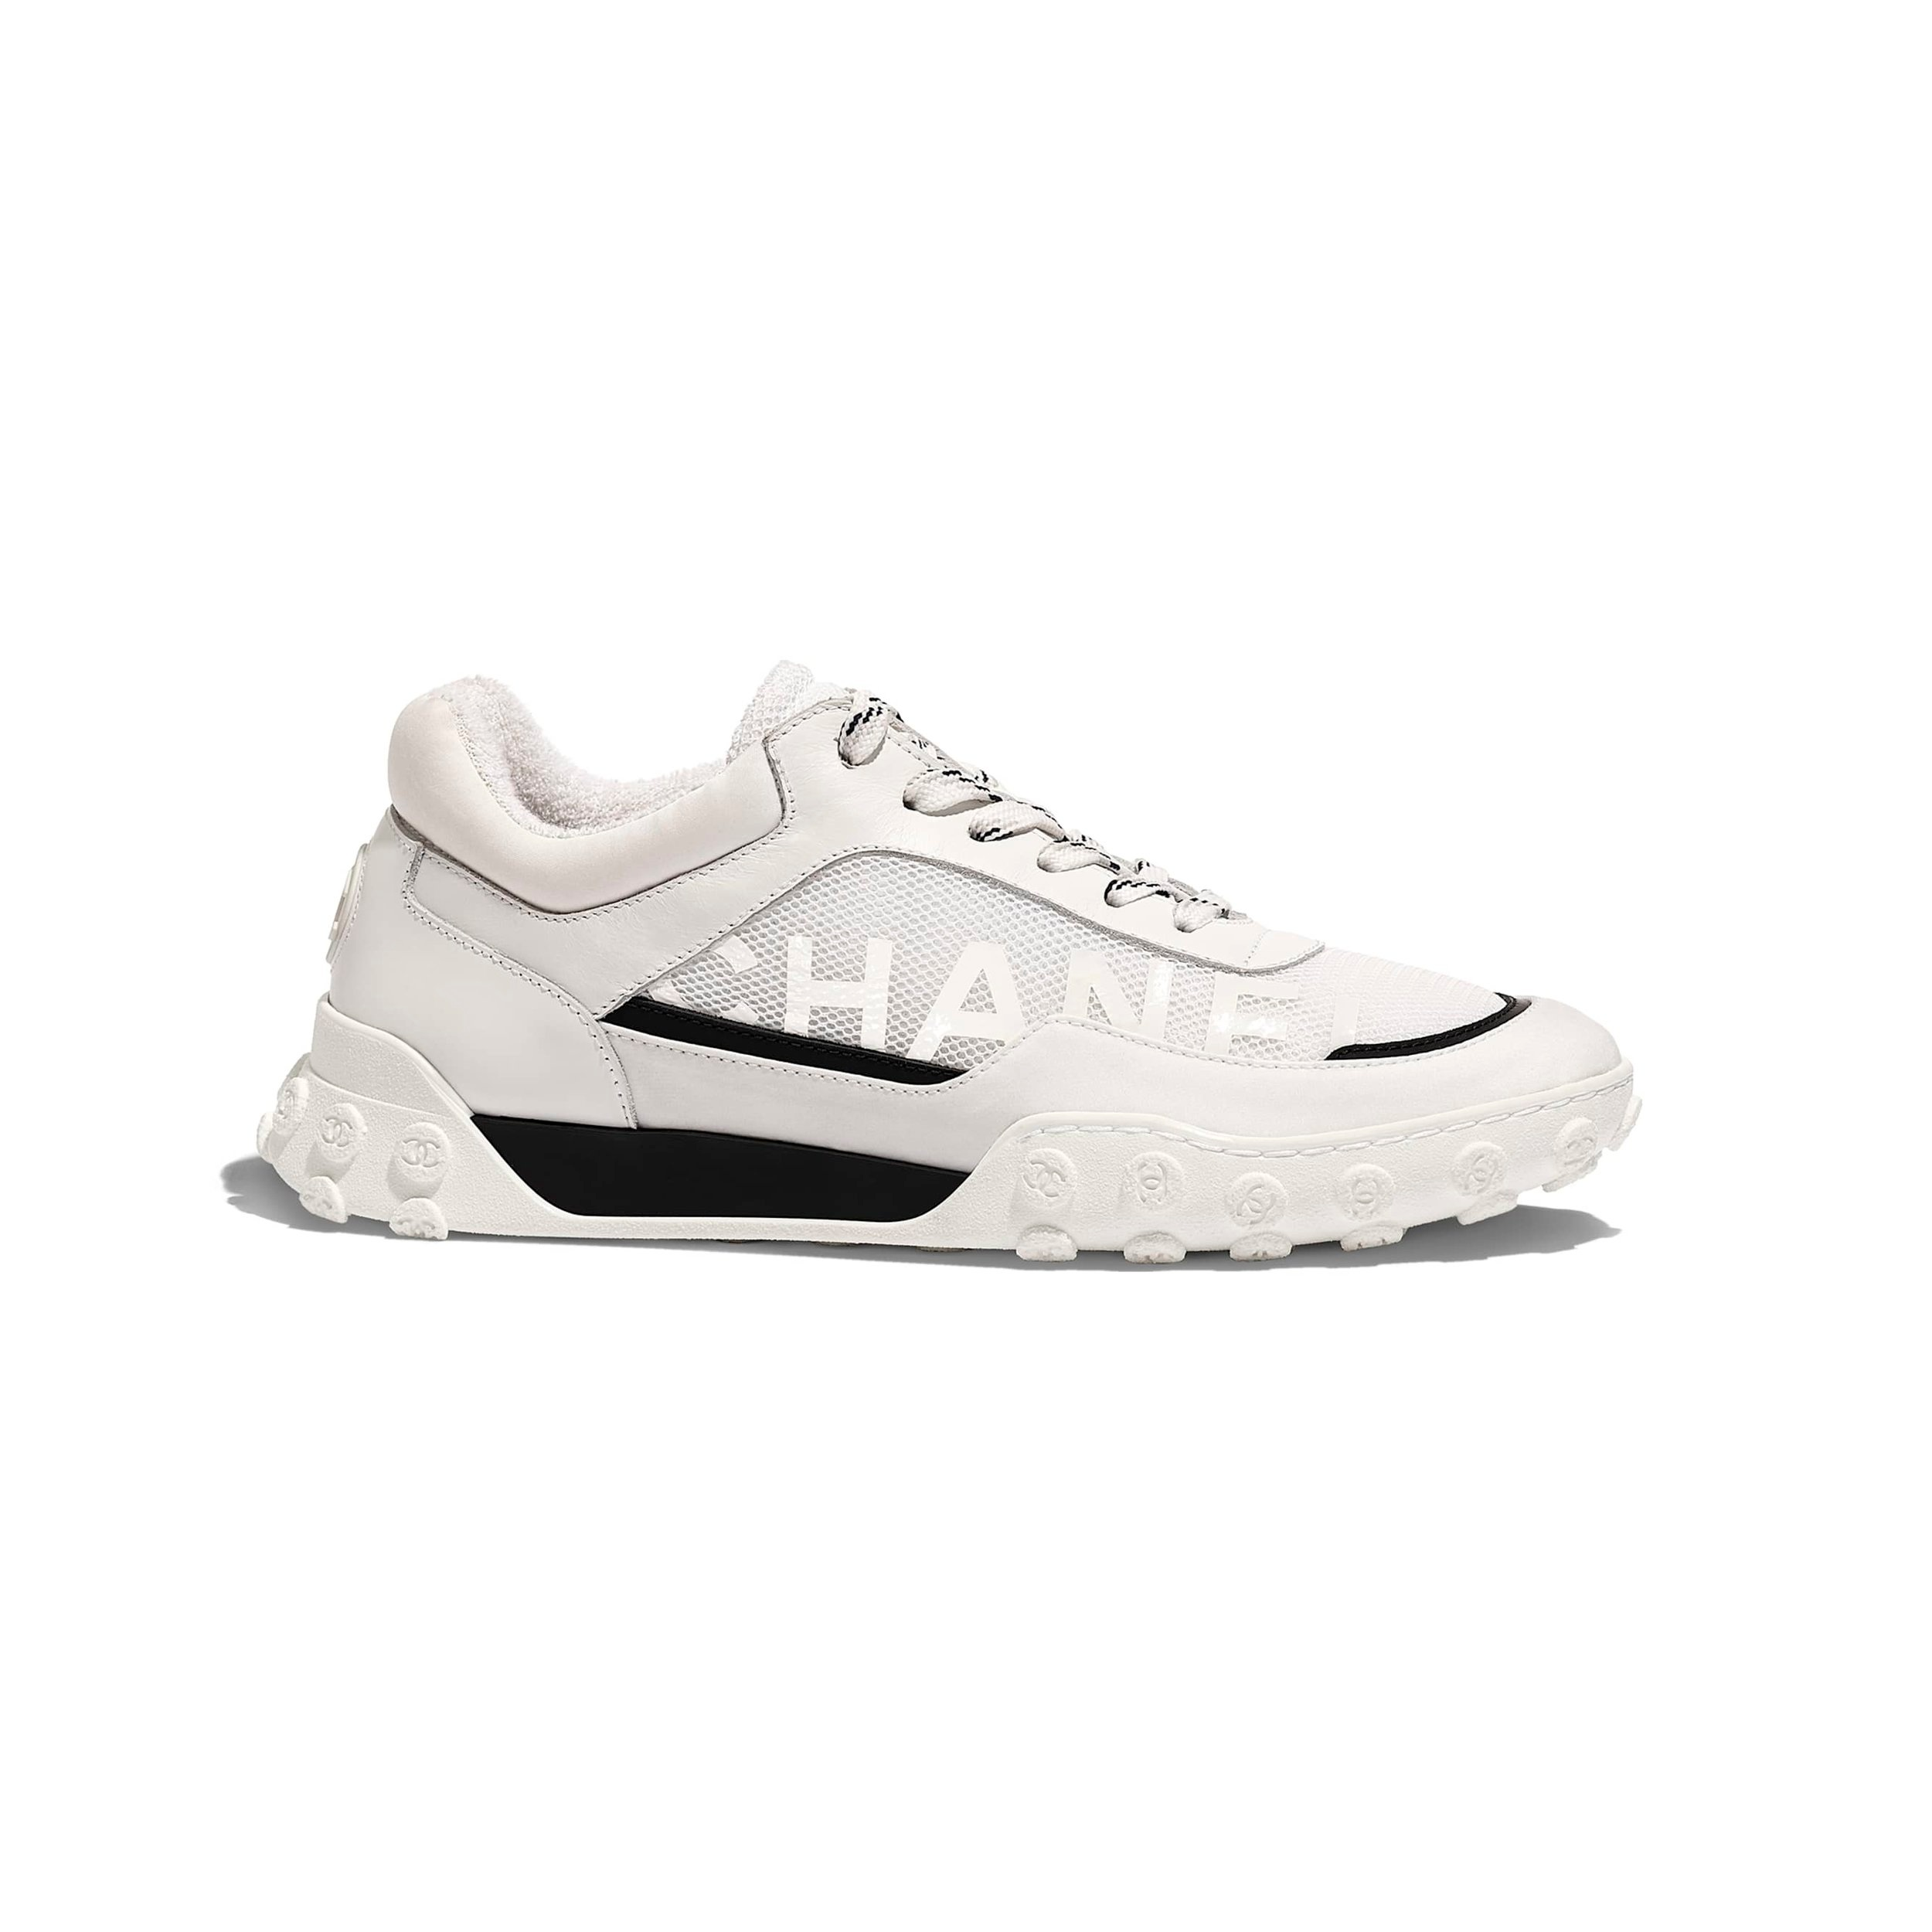 sneakers-white-calfskin-mesh-lycra-calfskin-mesh-lycra-packshot-default-g34086y5152610601-8808862515230.jpg